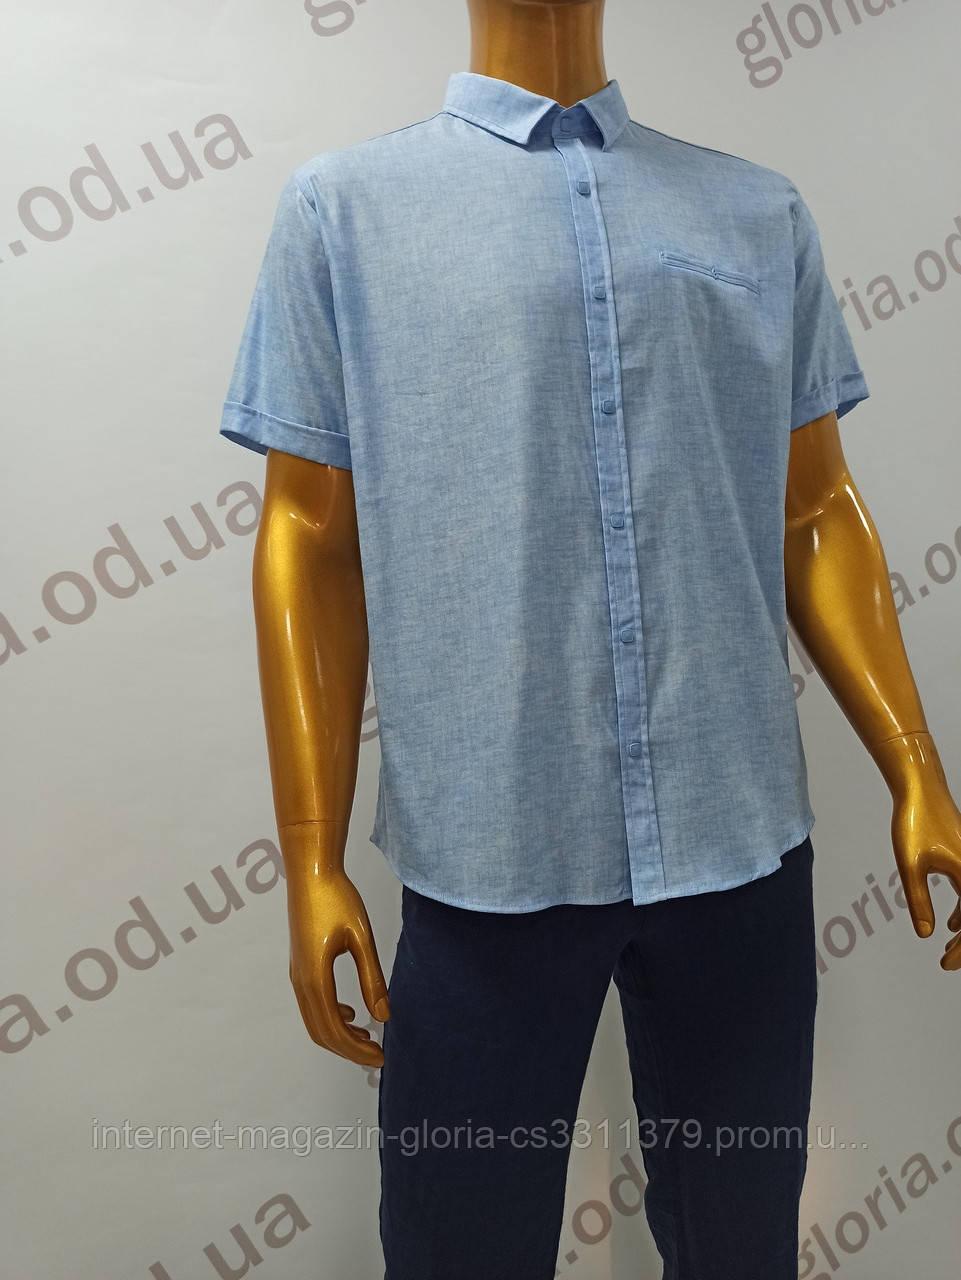 Мужская рубашка Amato. AG  29913(г). Размеры: Батал 2XL,3XL,4XL,5XL.